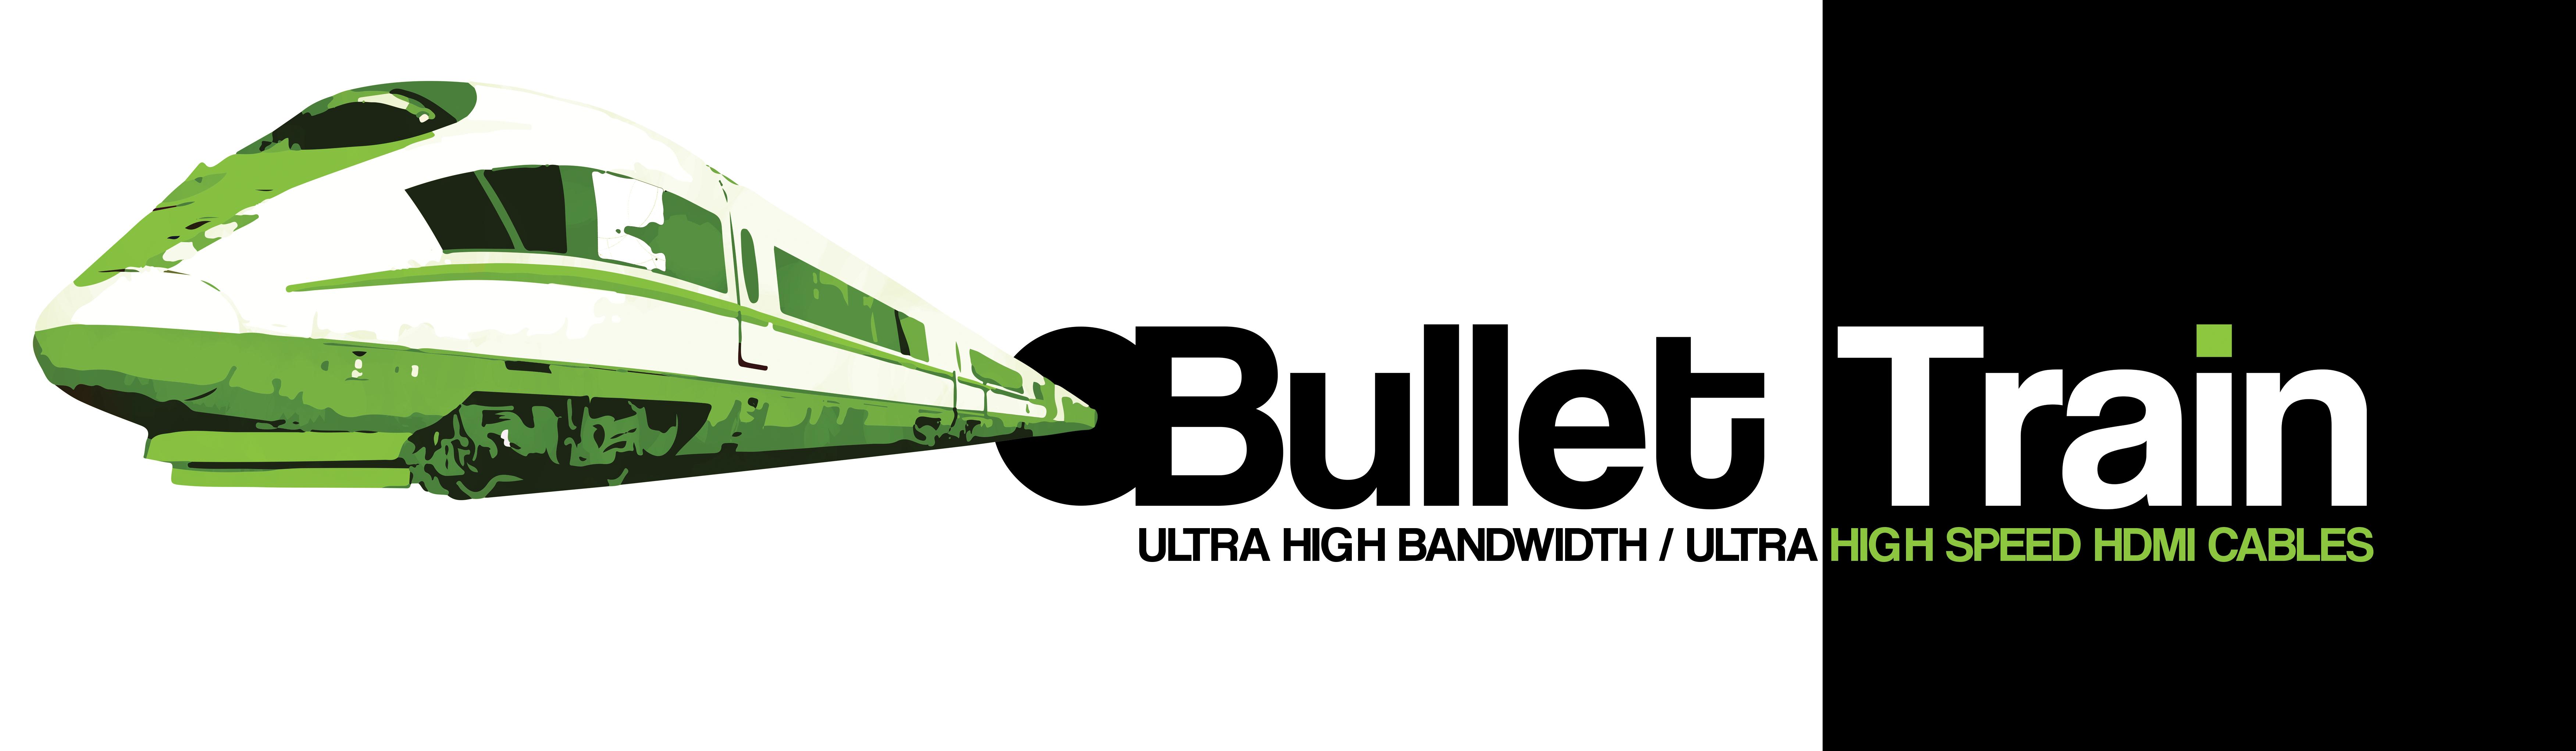 bullet train bullet train